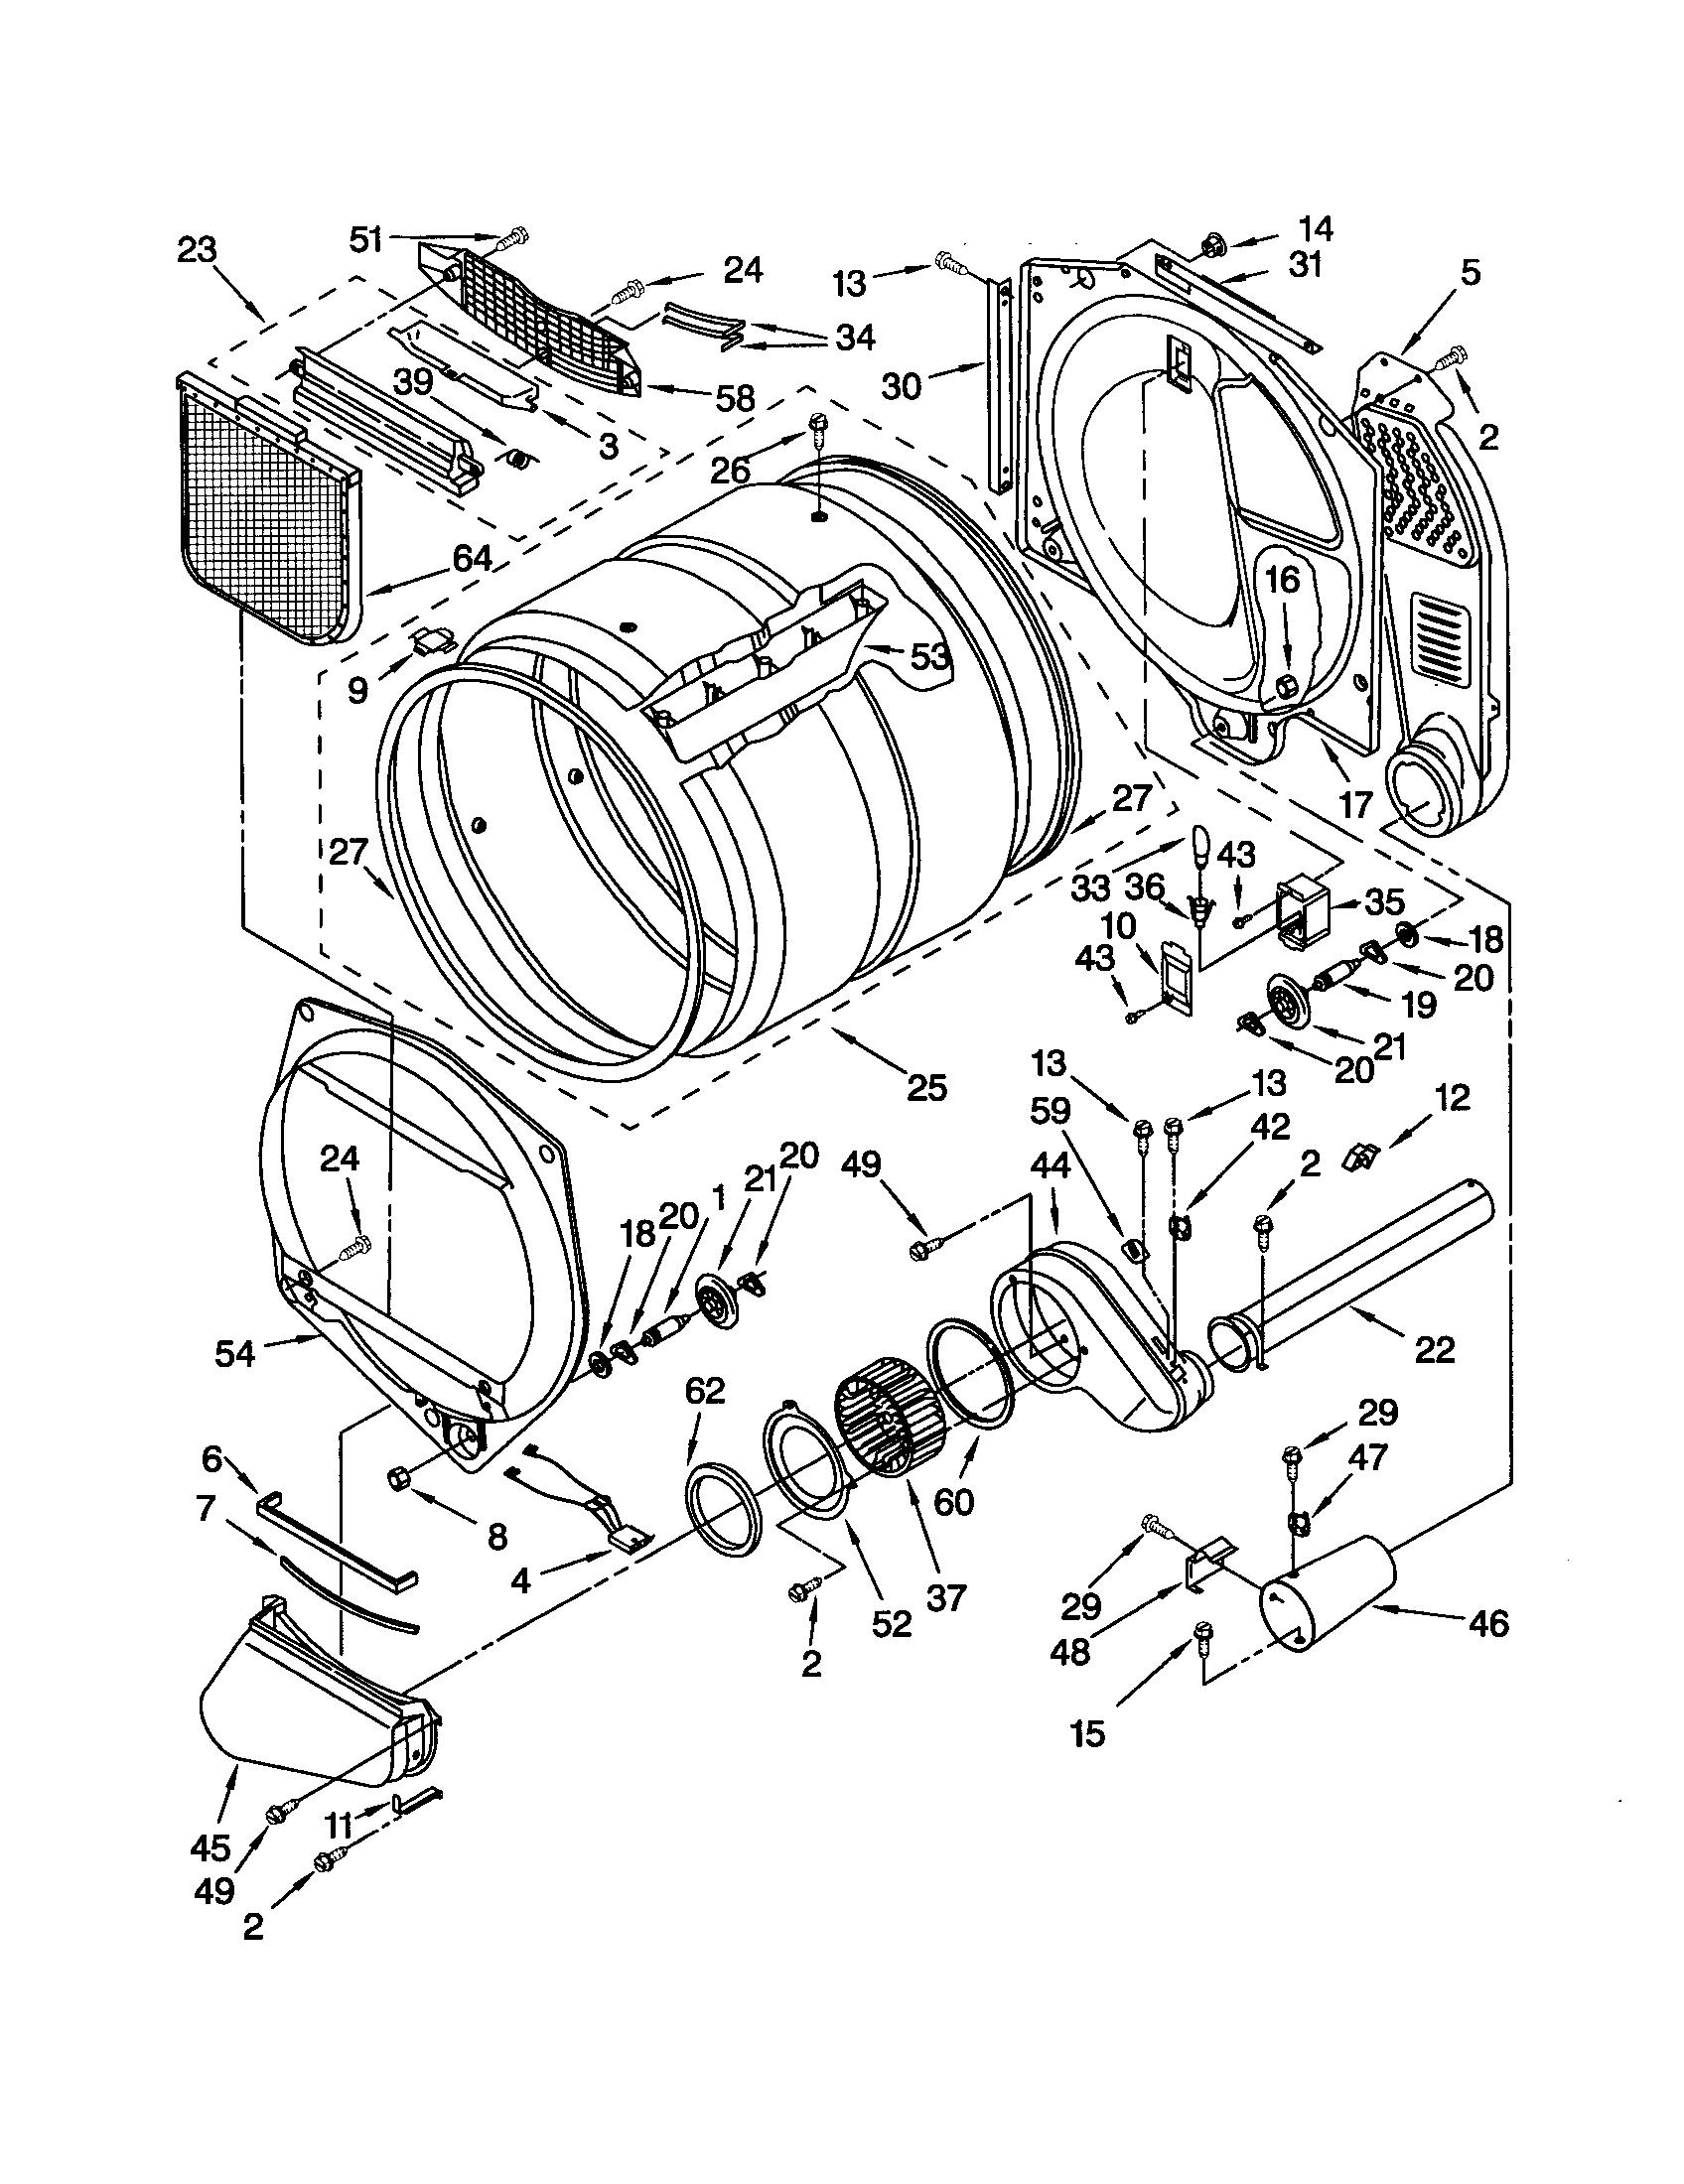 image result for kenmore elite he3 gas dryer wiring diagram diy image result for kenmore elite [ 1696 x 2200 Pixel ]